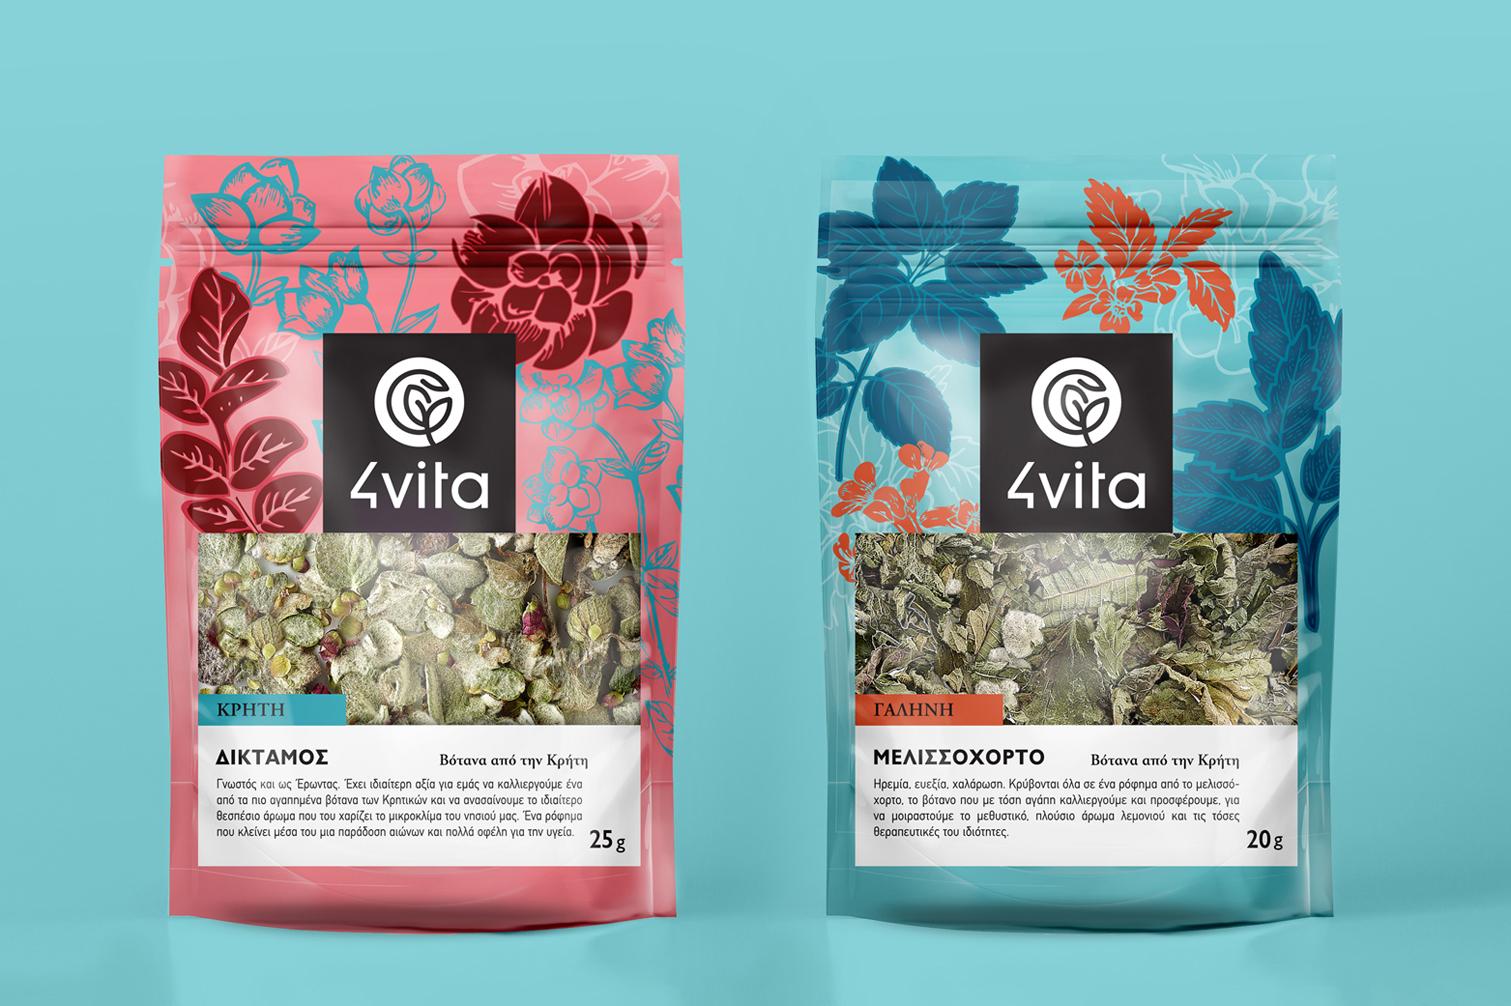 Deep Blue Design Creates Herbs Packaging Design For 4vita